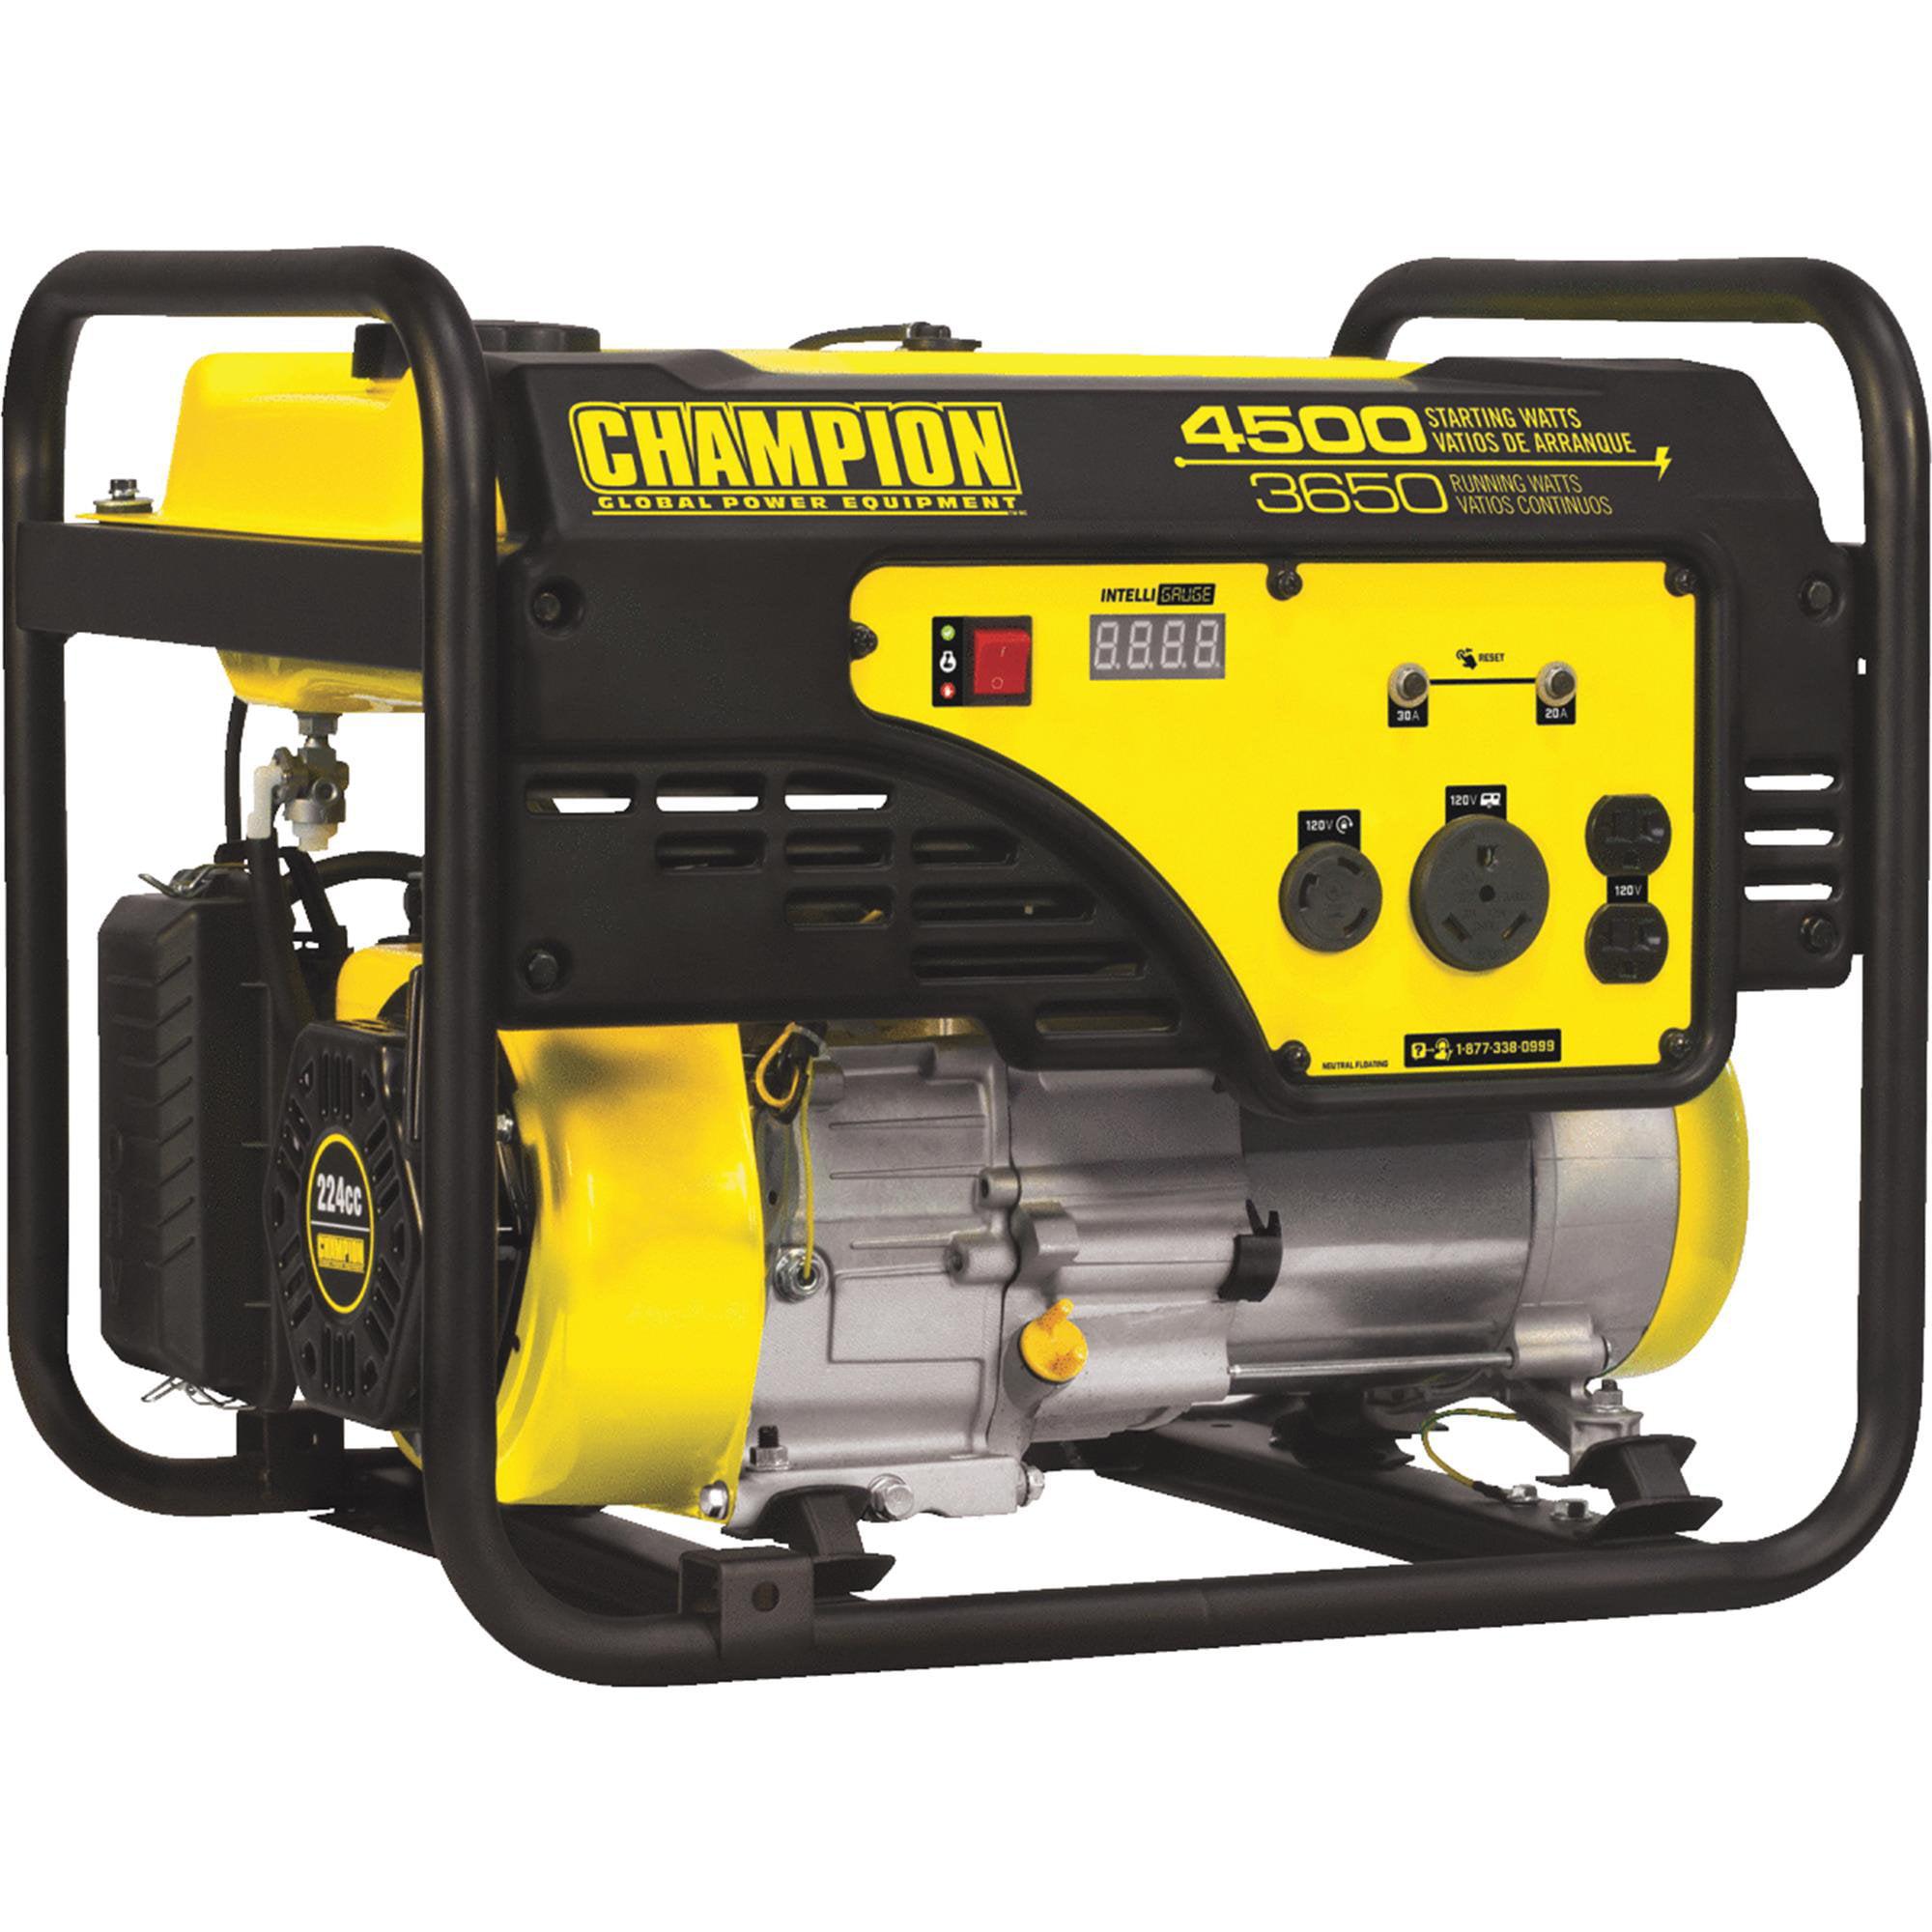 Champion 3650w Portable Generator Onan Remote Start Wiring Diagram As Well Wheel Horse